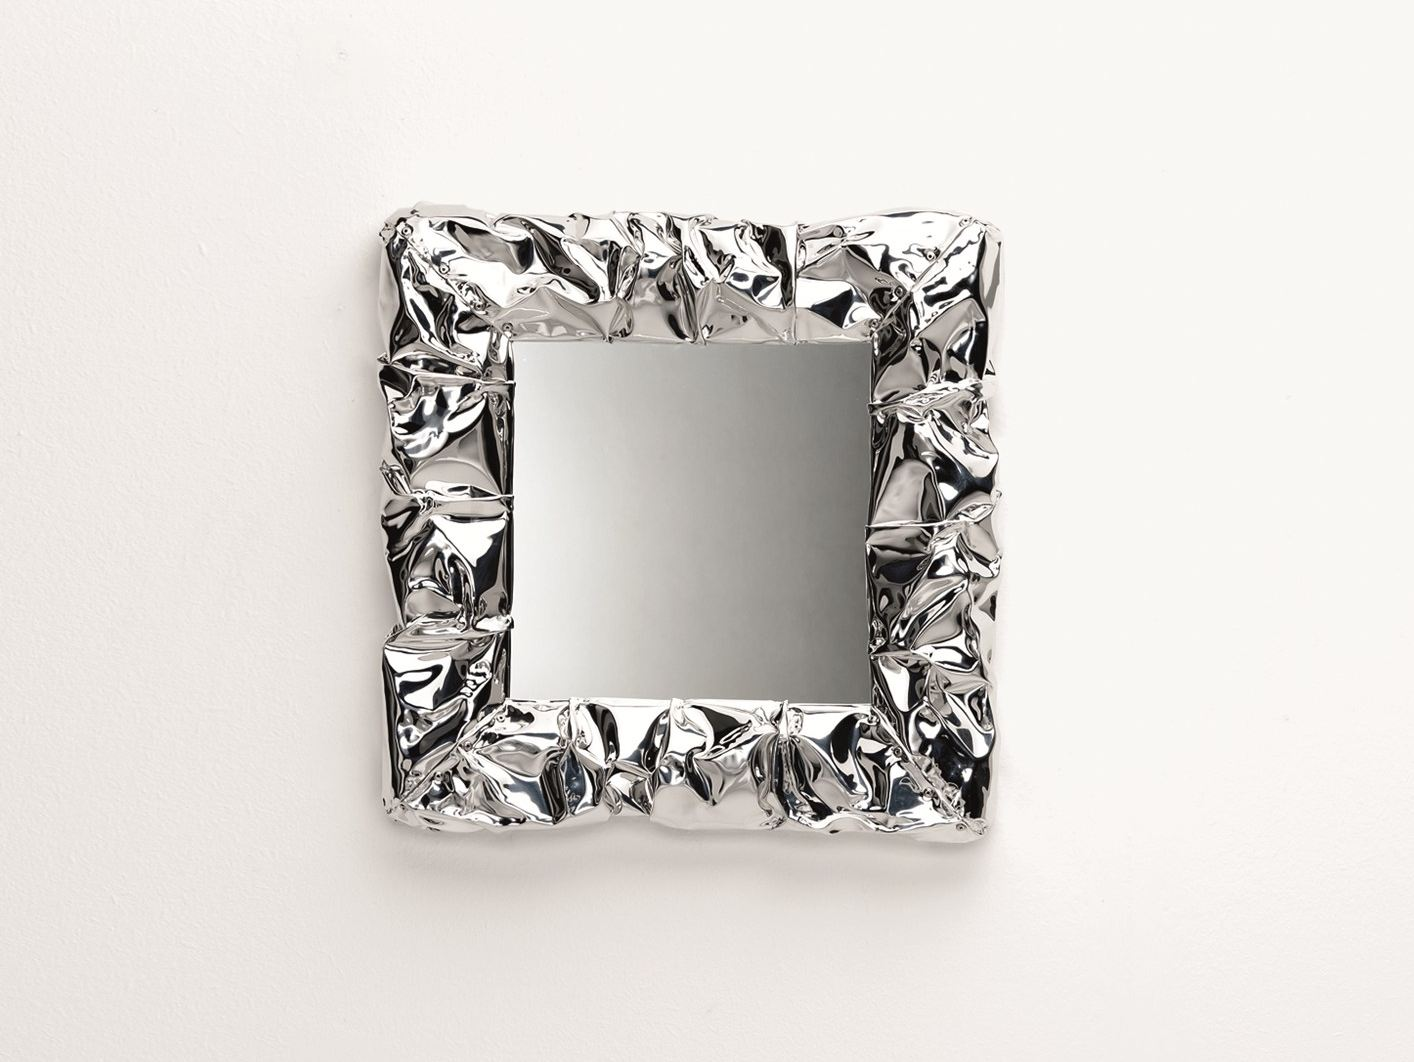 Miroir mural avec cadre tab u mirror micro by opinion for Cadre photo mural design